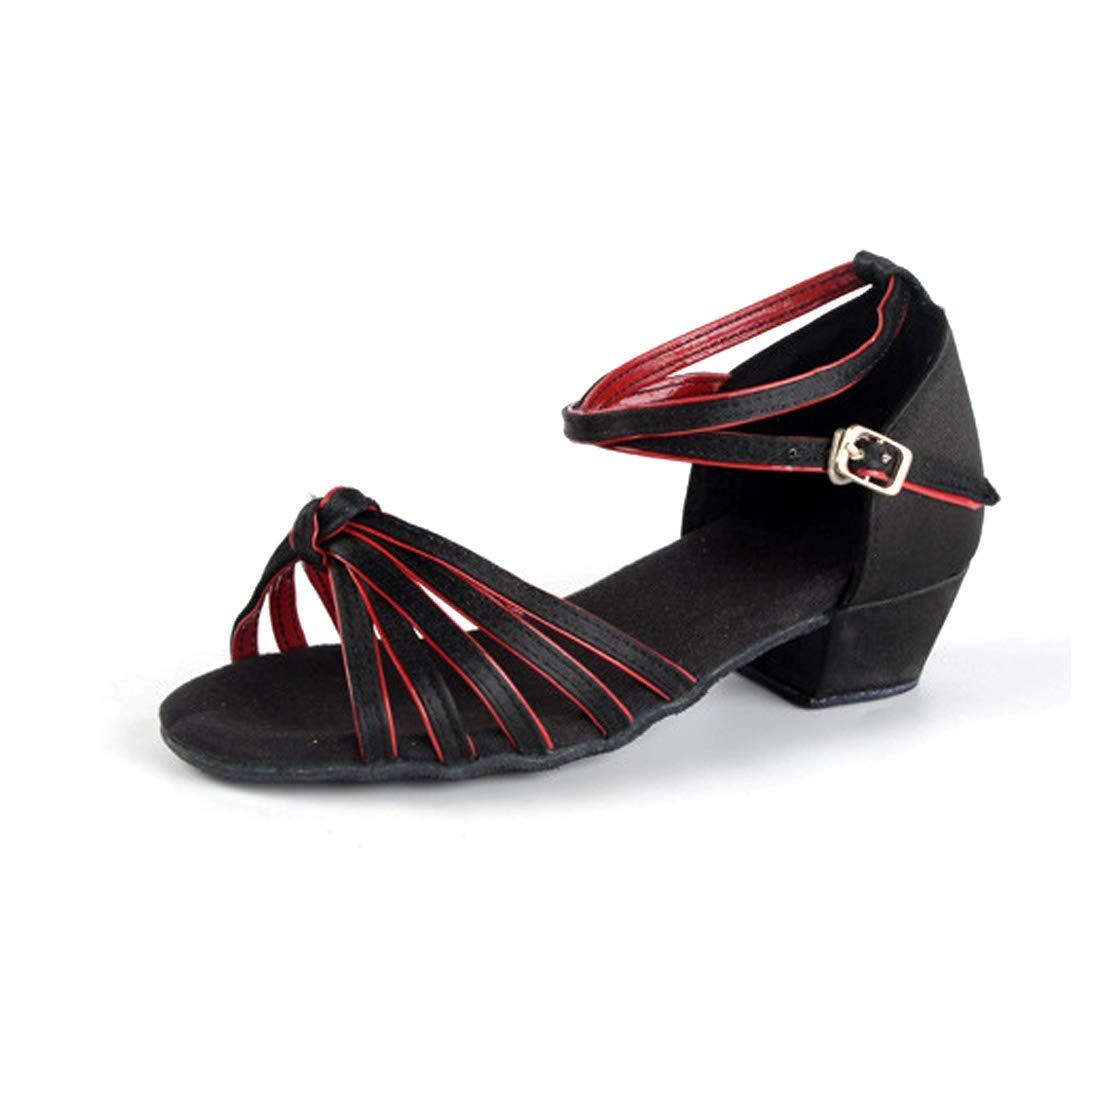 Inlefen Girls Dress Shoes Latin Ballroom Dance Shoes Tango Sequin Salsa Party